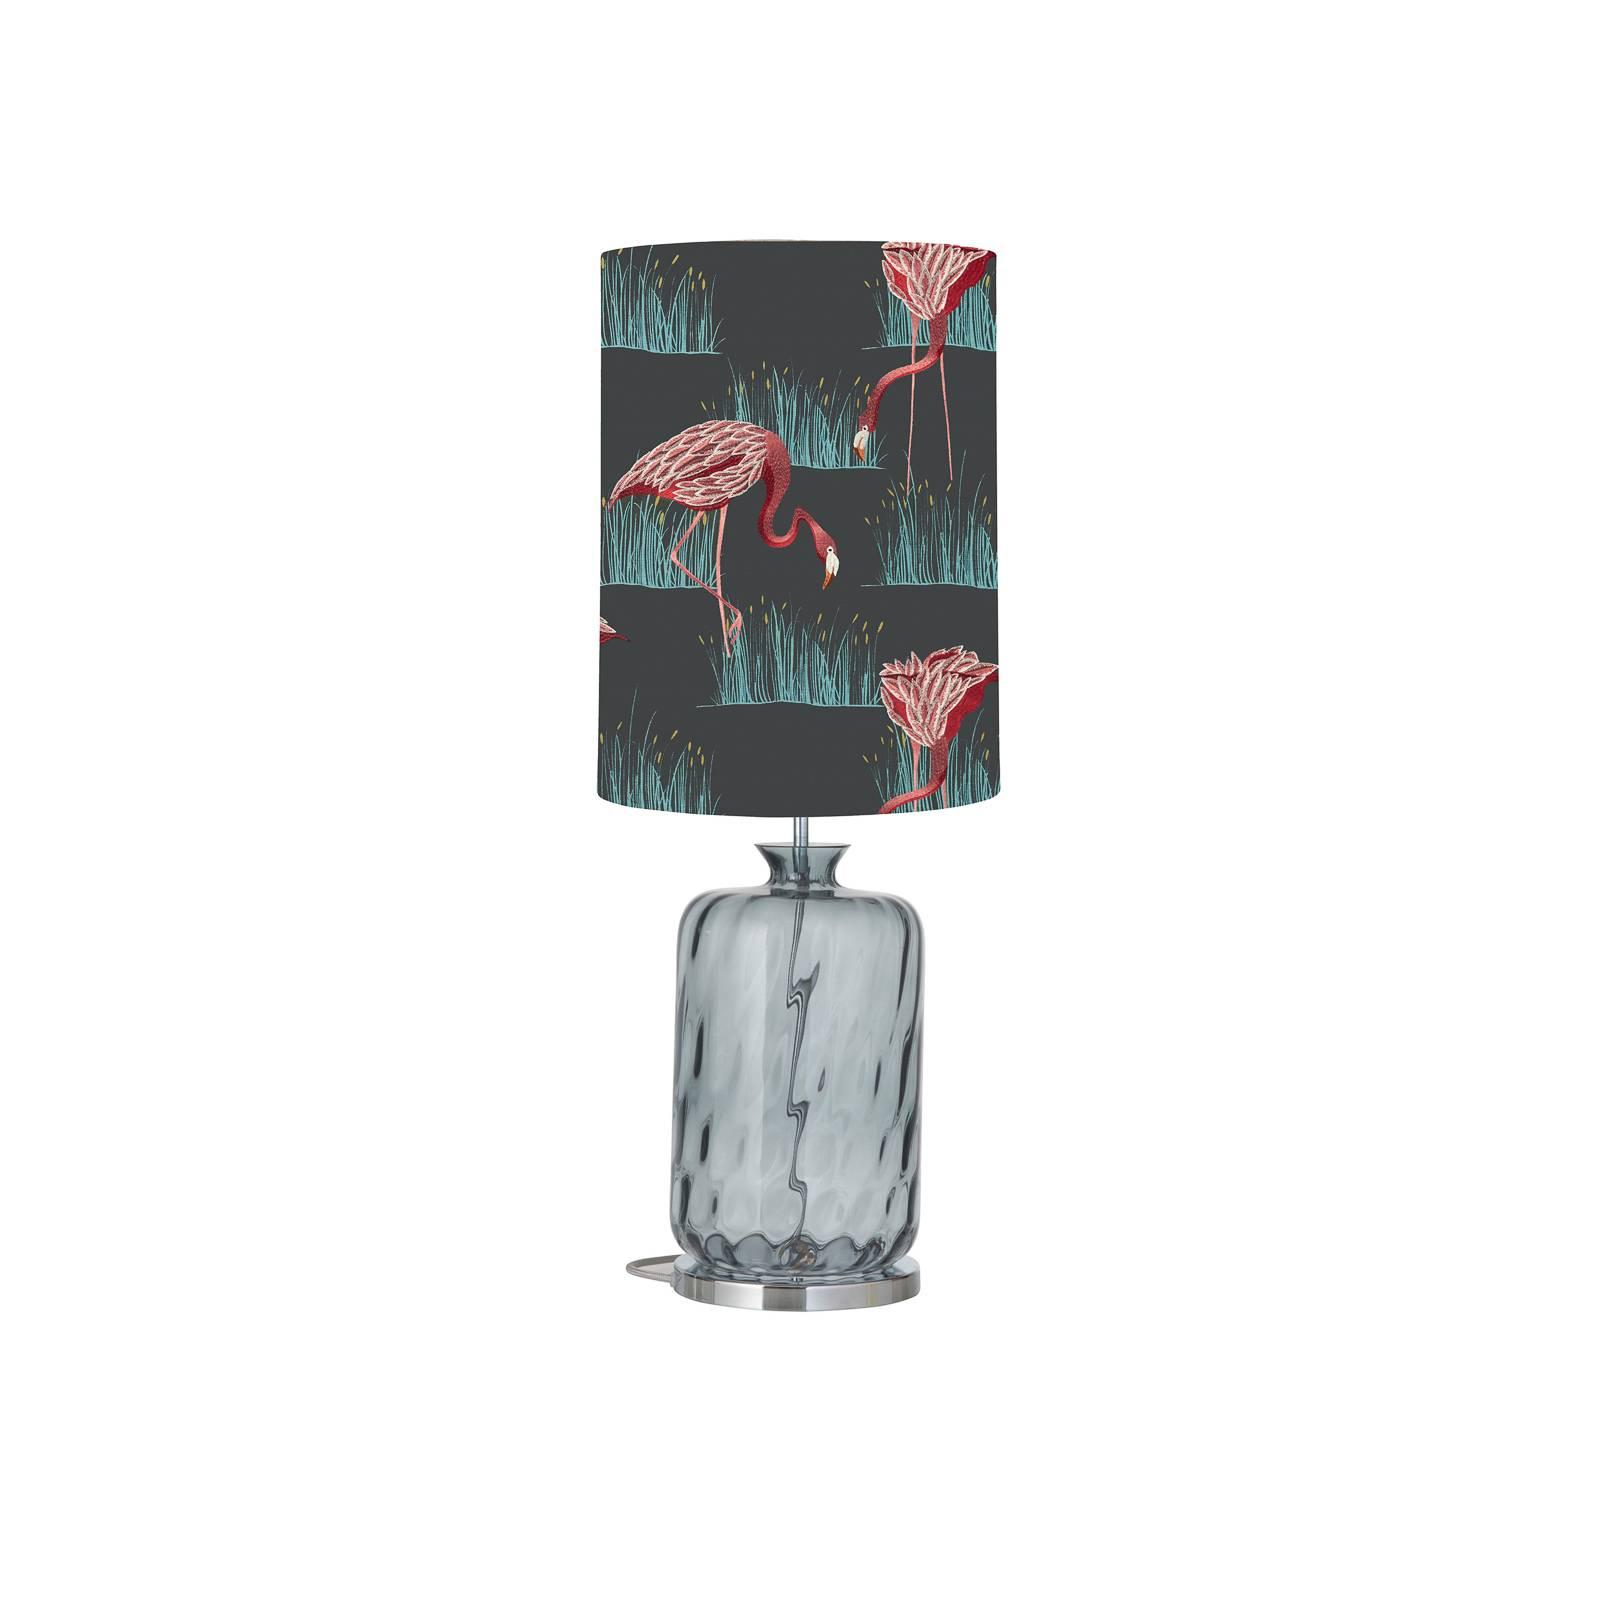 EBB & FLOW Pillar lampe à poser azelea/lagoon